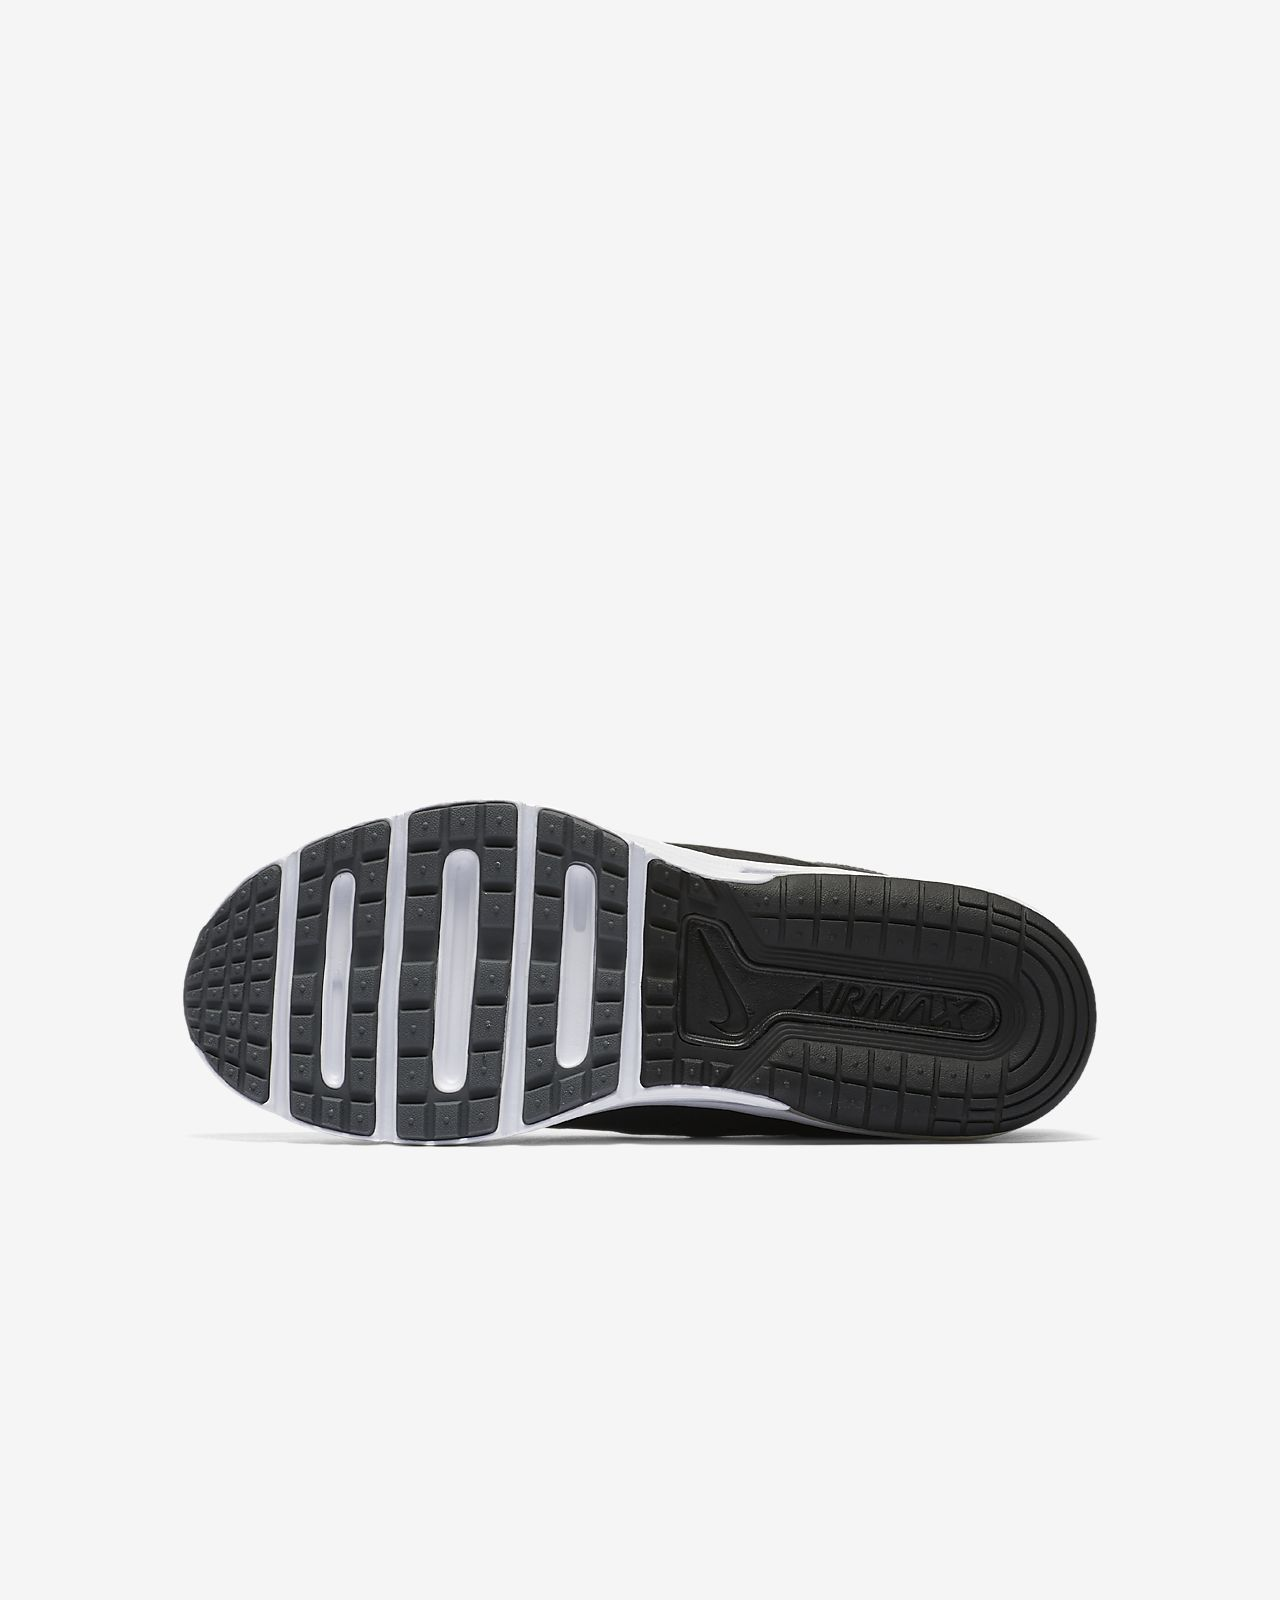 best loved 90e4d 94a9d ... Nike Air Max Sequent 3 Zapatillas - Niño a